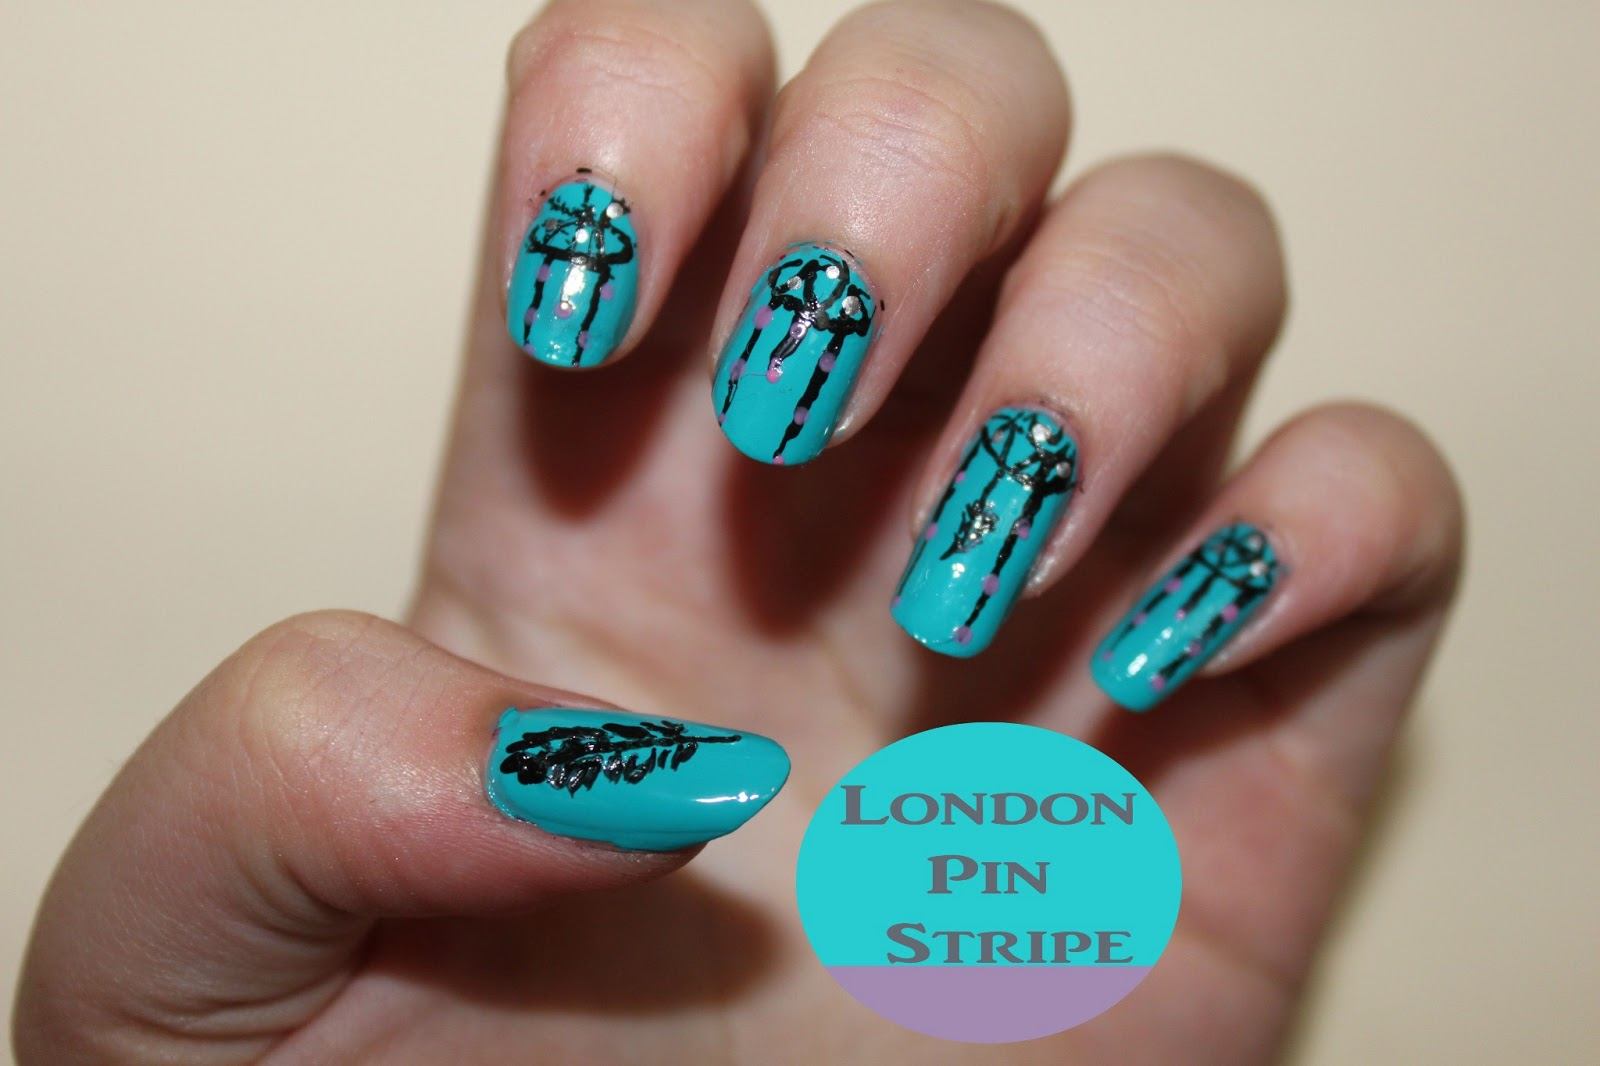 Dream catcher nails | London Pin Stripe